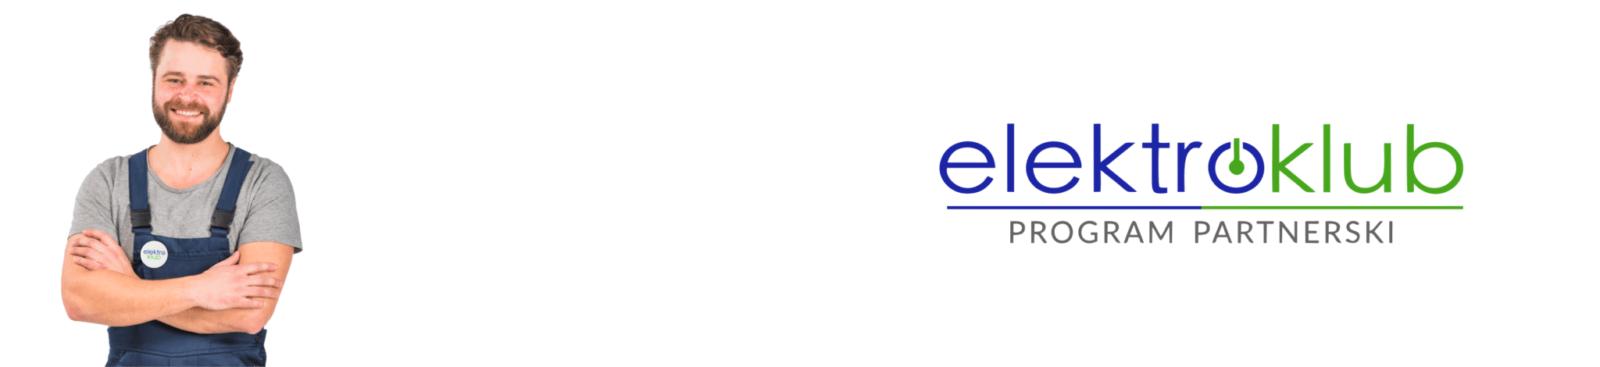 elektroklub, elmax